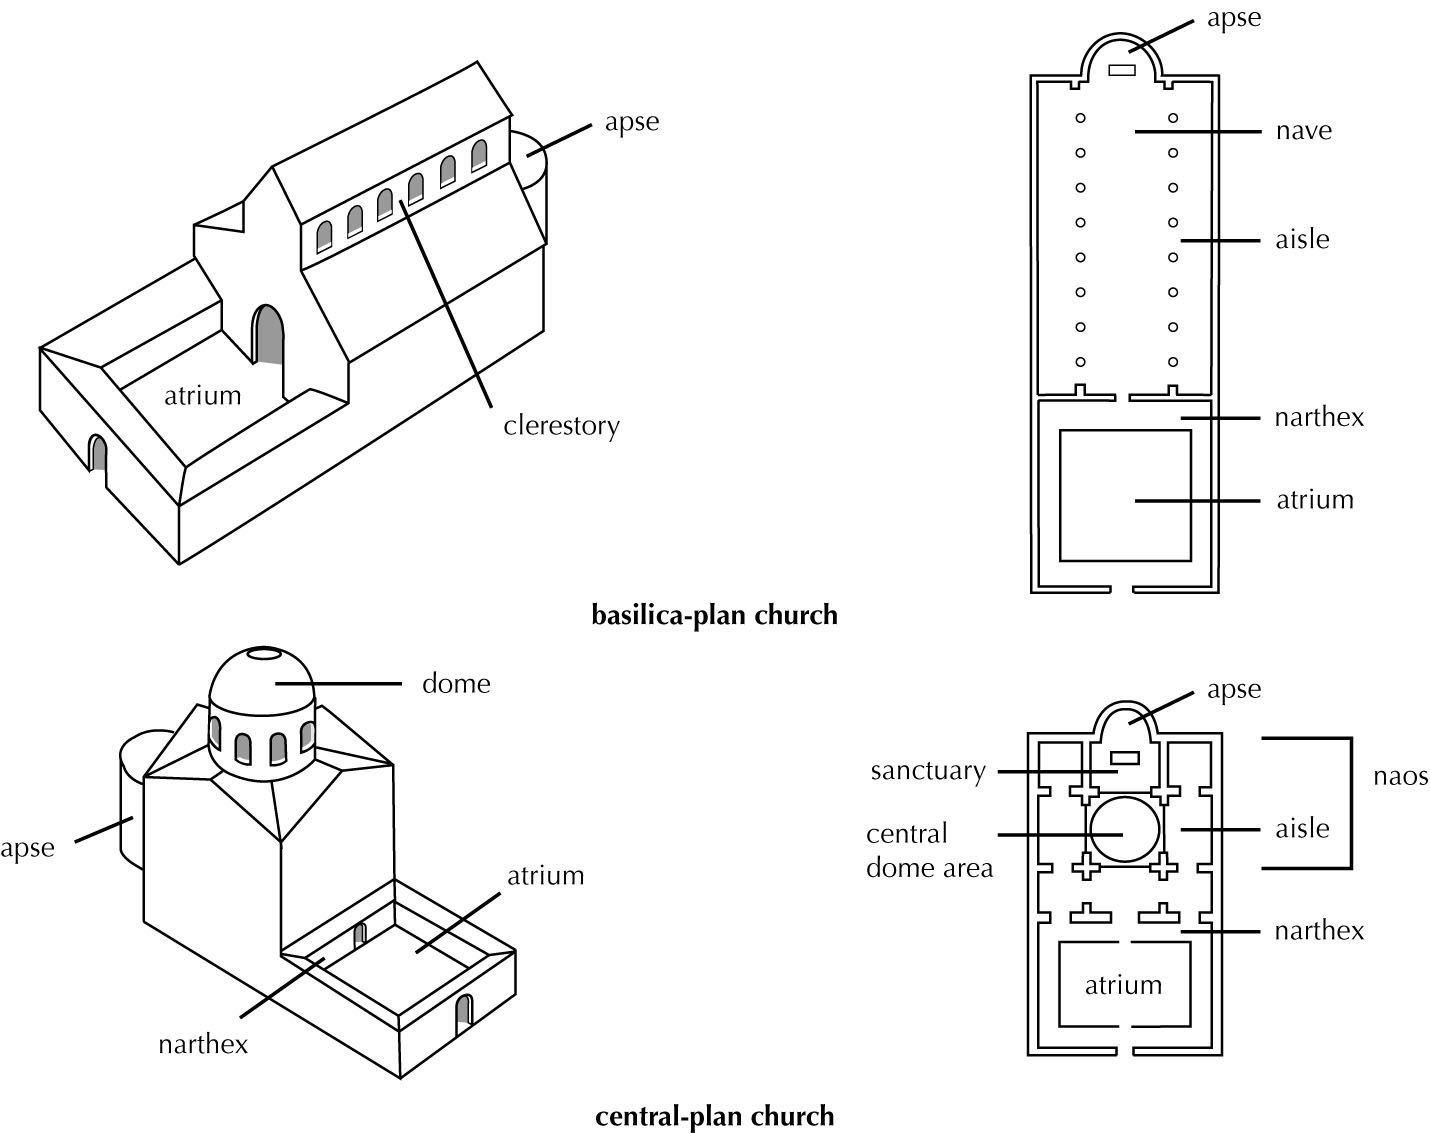 medium resolution of basilica church plan